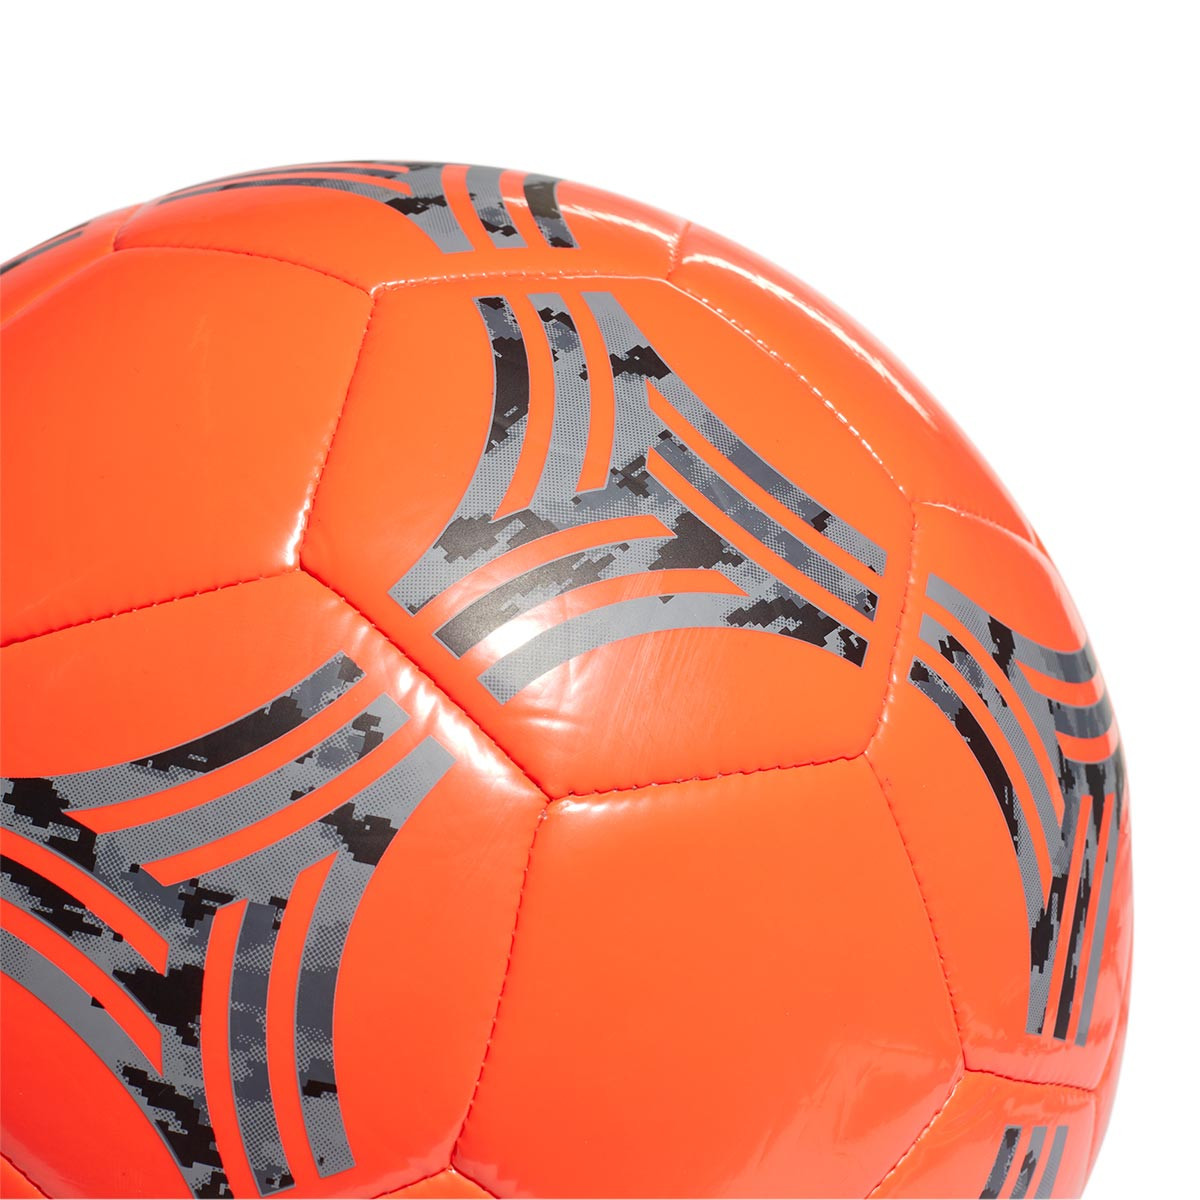 ejemplo Espere acerca de  Ball adidas Tango Street Capitano Semi solar red-Carbon-Black-Grey Theree -  Football store Fútbol Emotion